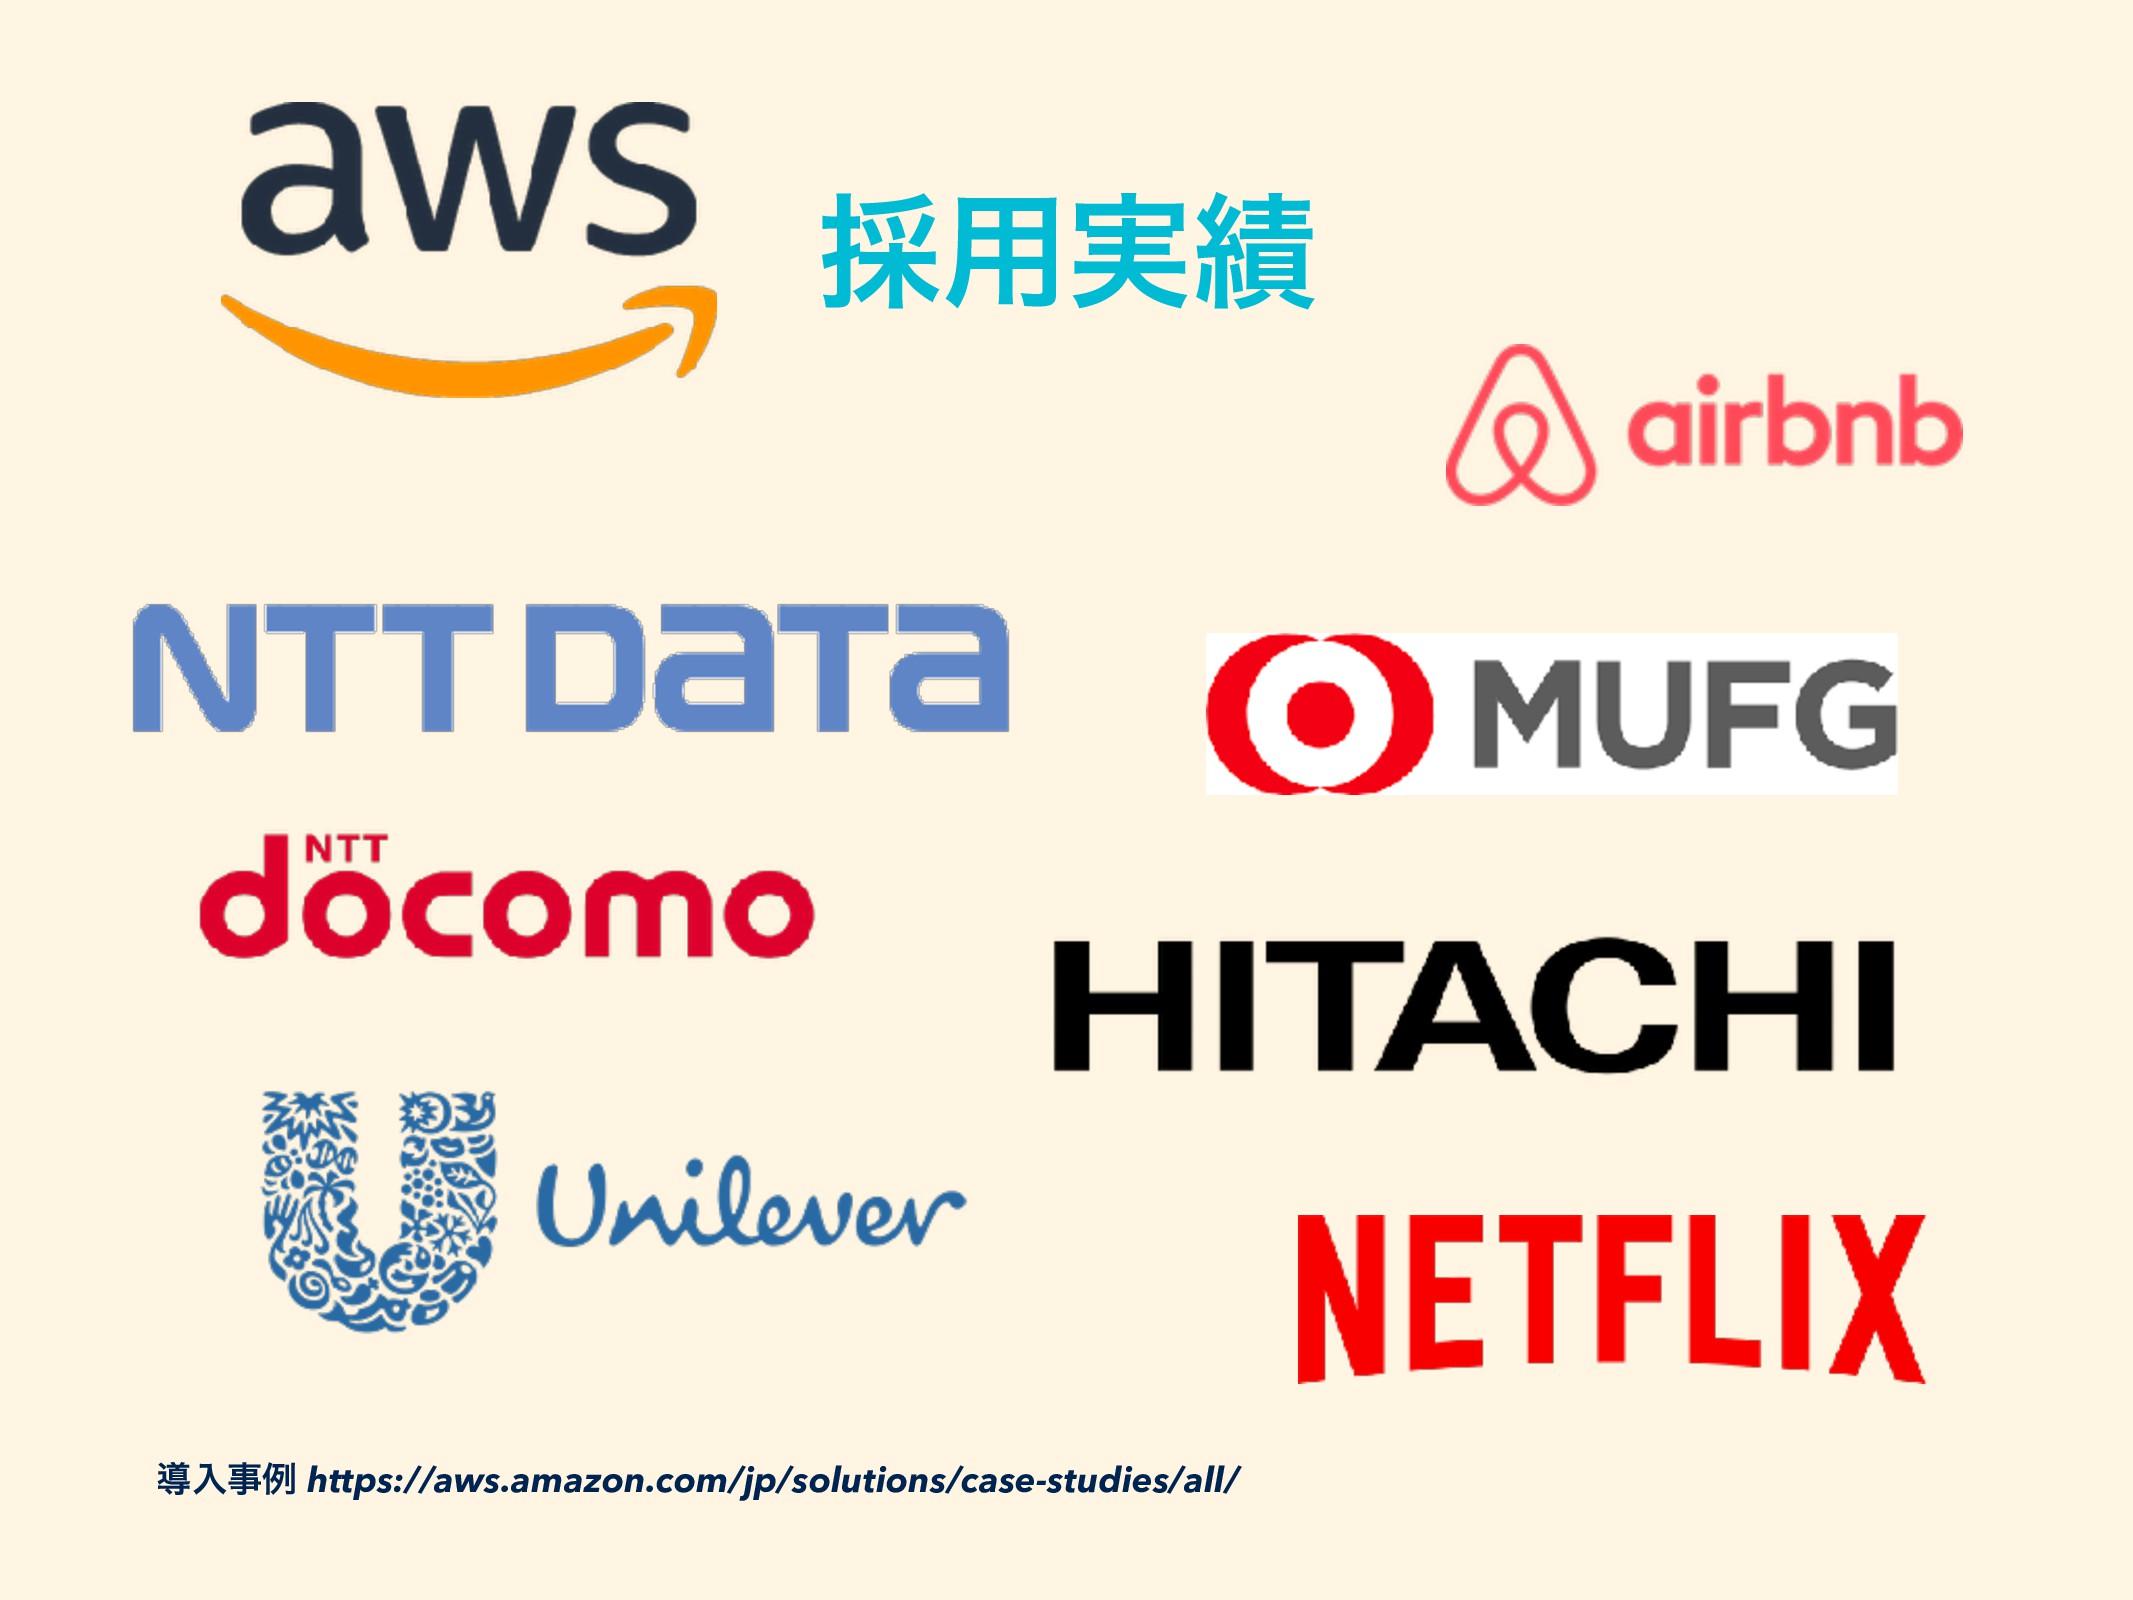 ࠾༻࣮ ಋೖྫ https://aws.amazon.com/jp/solutions/c...